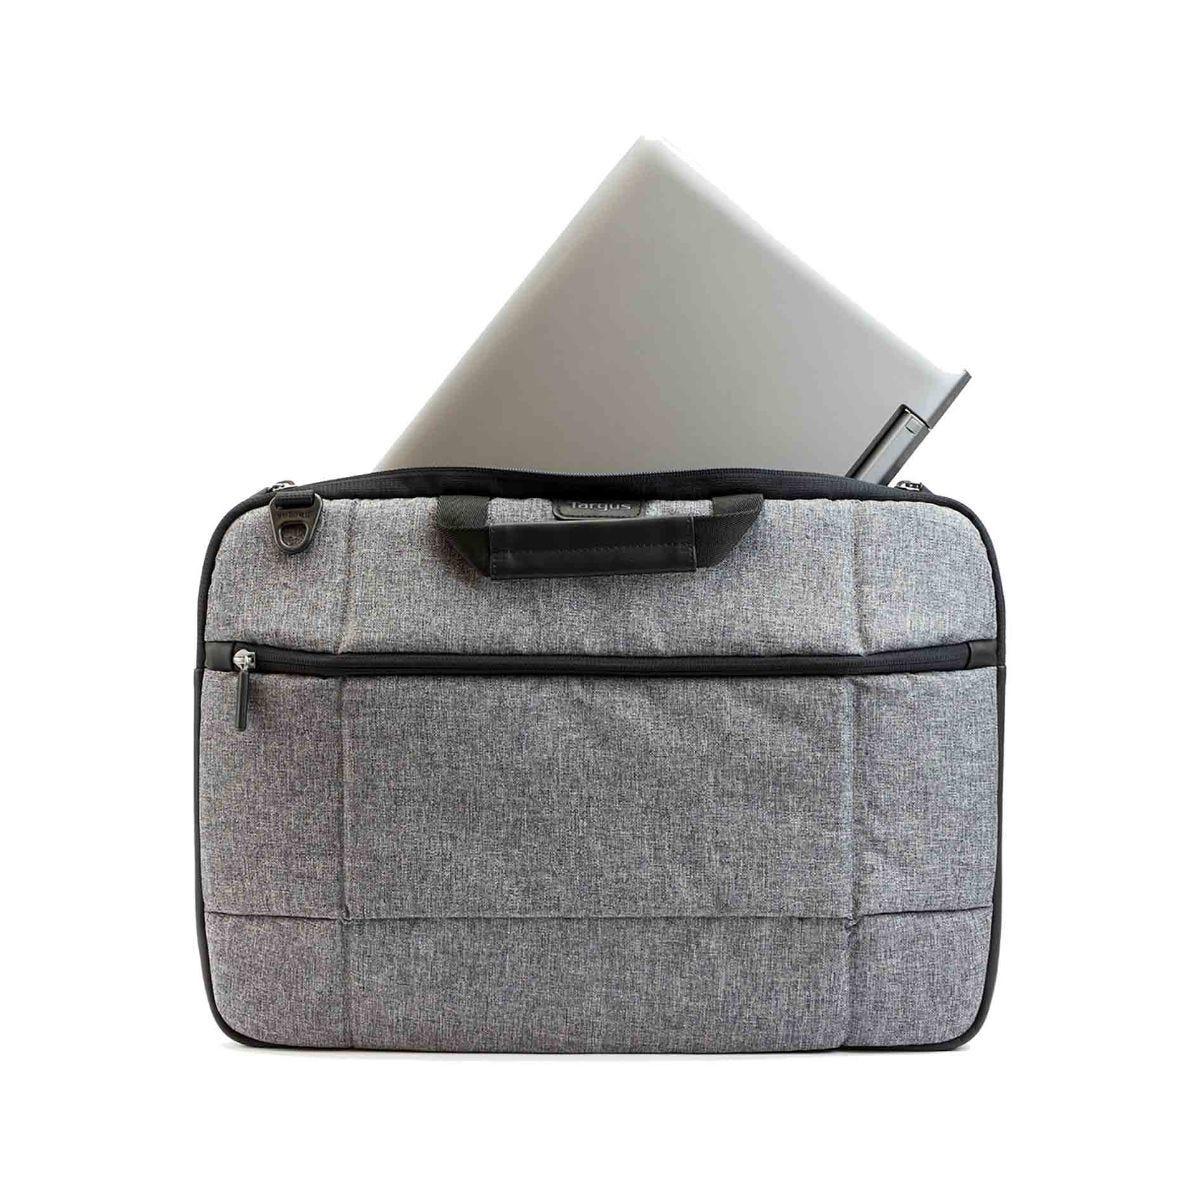 Image of Targus Strata Pro Laptop Slipcase 15.6 Inch Grey, Grey